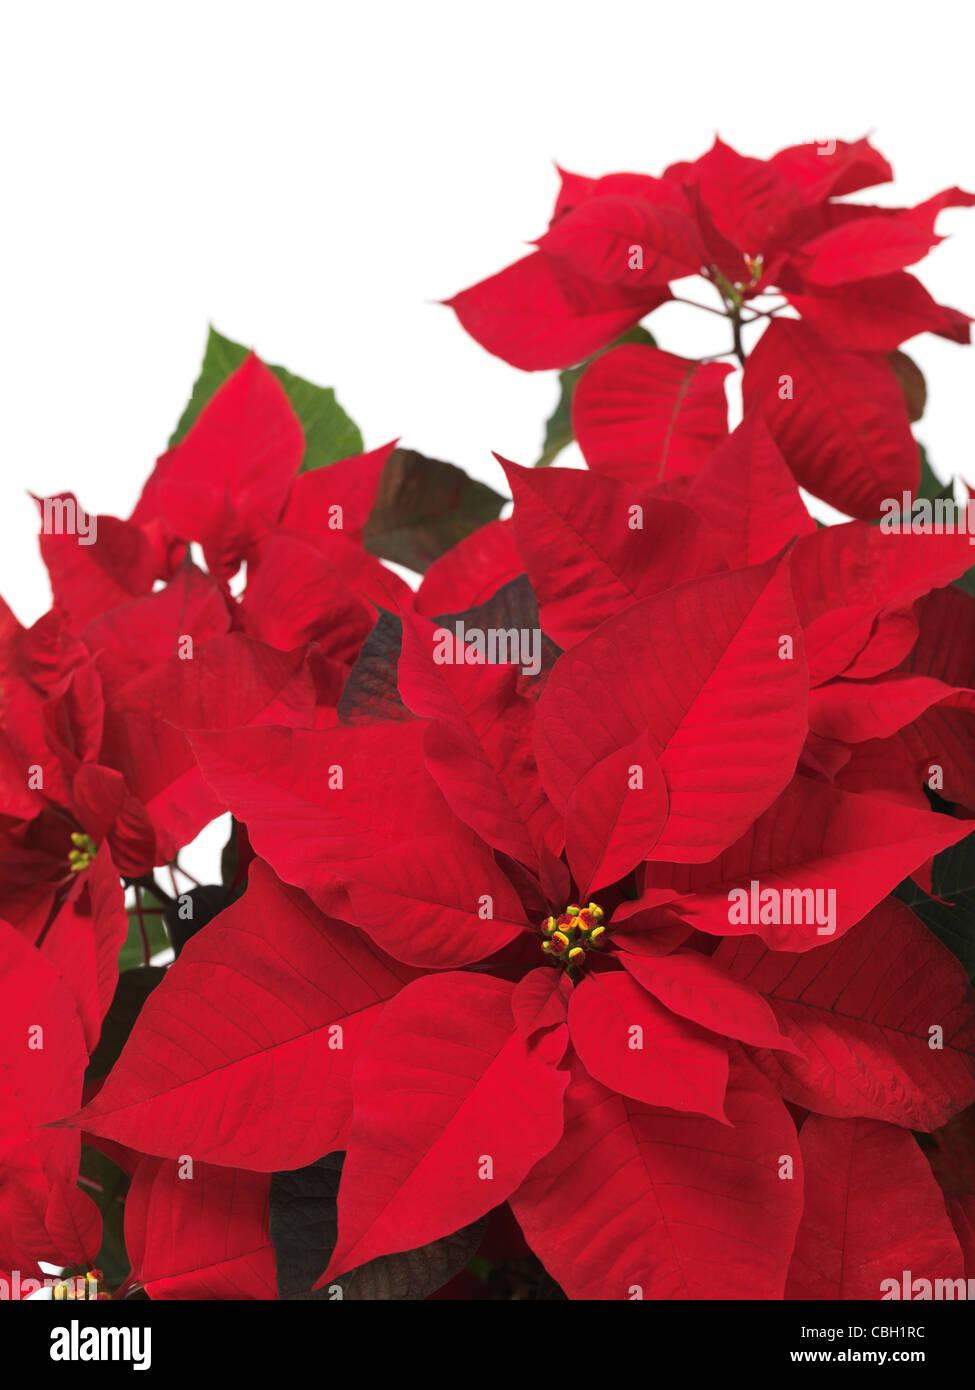 Red Christmas Flower.Poinsettia Red Christmas Flower Leaves On White Background